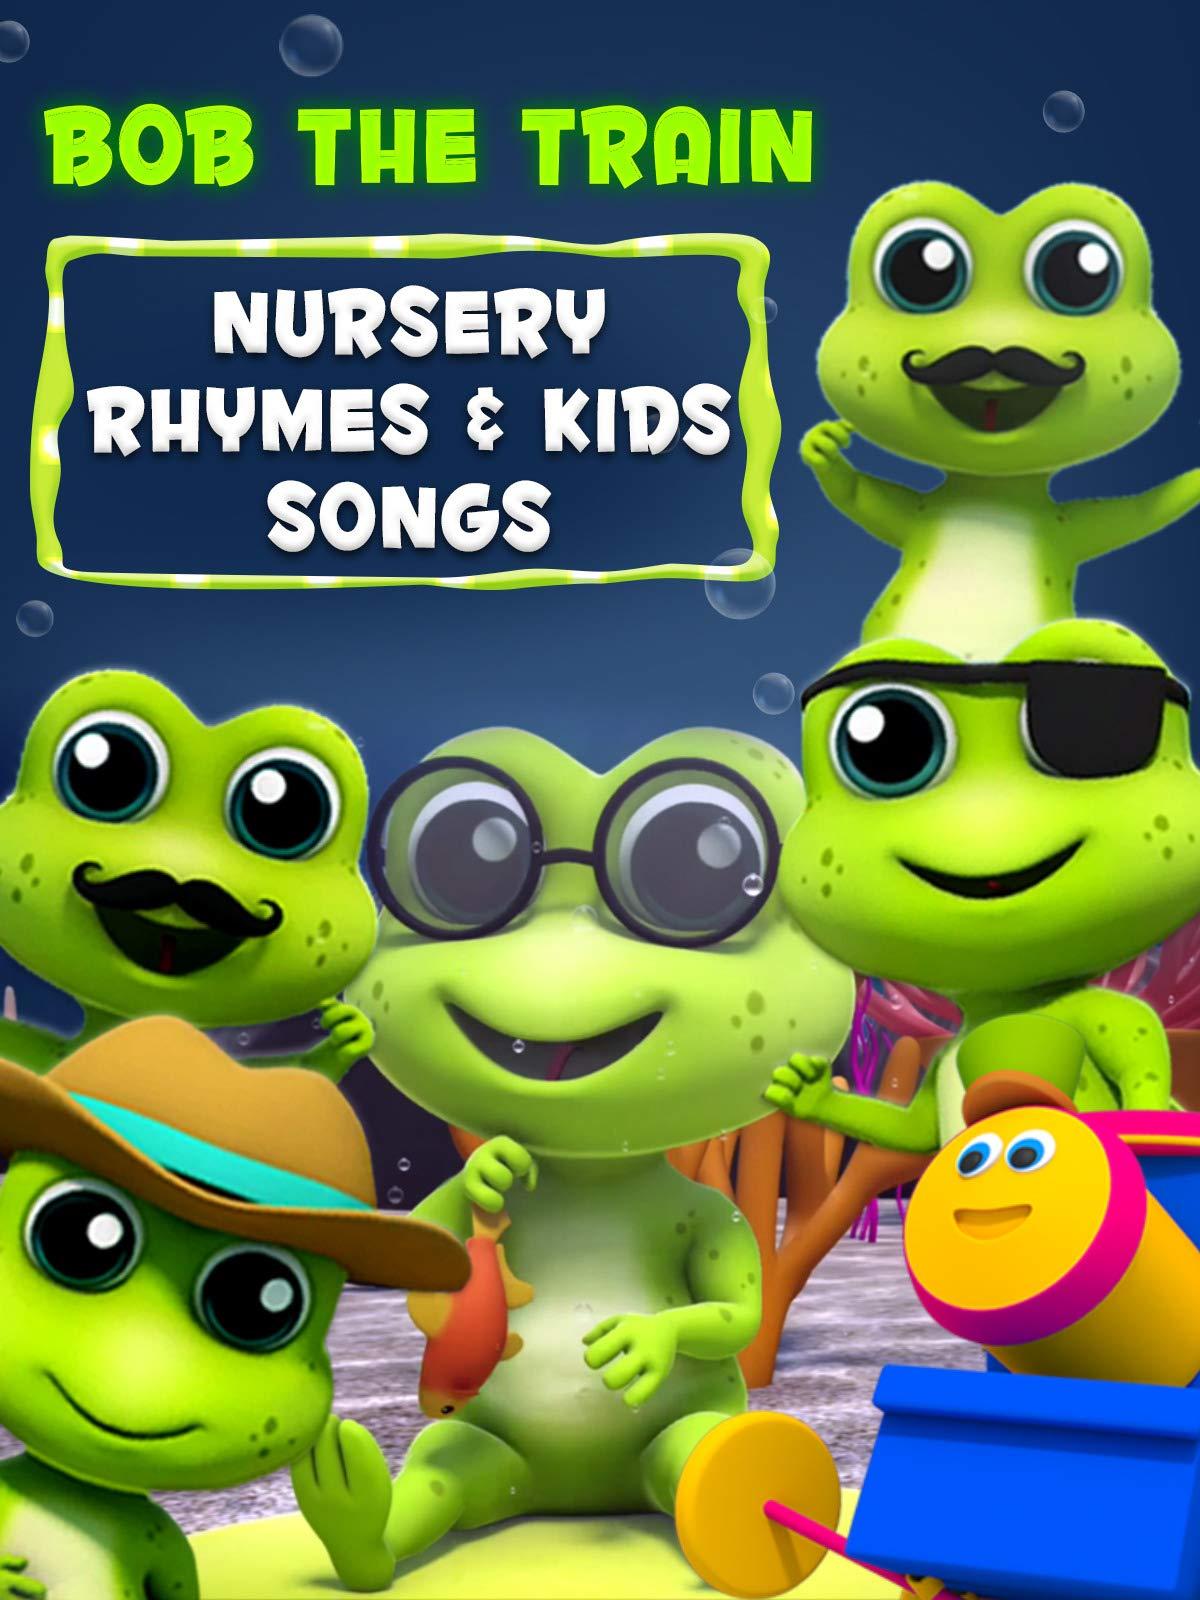 Nursery Rhymes & Kids Songs - Bob The Train on Amazon Prime Video UK